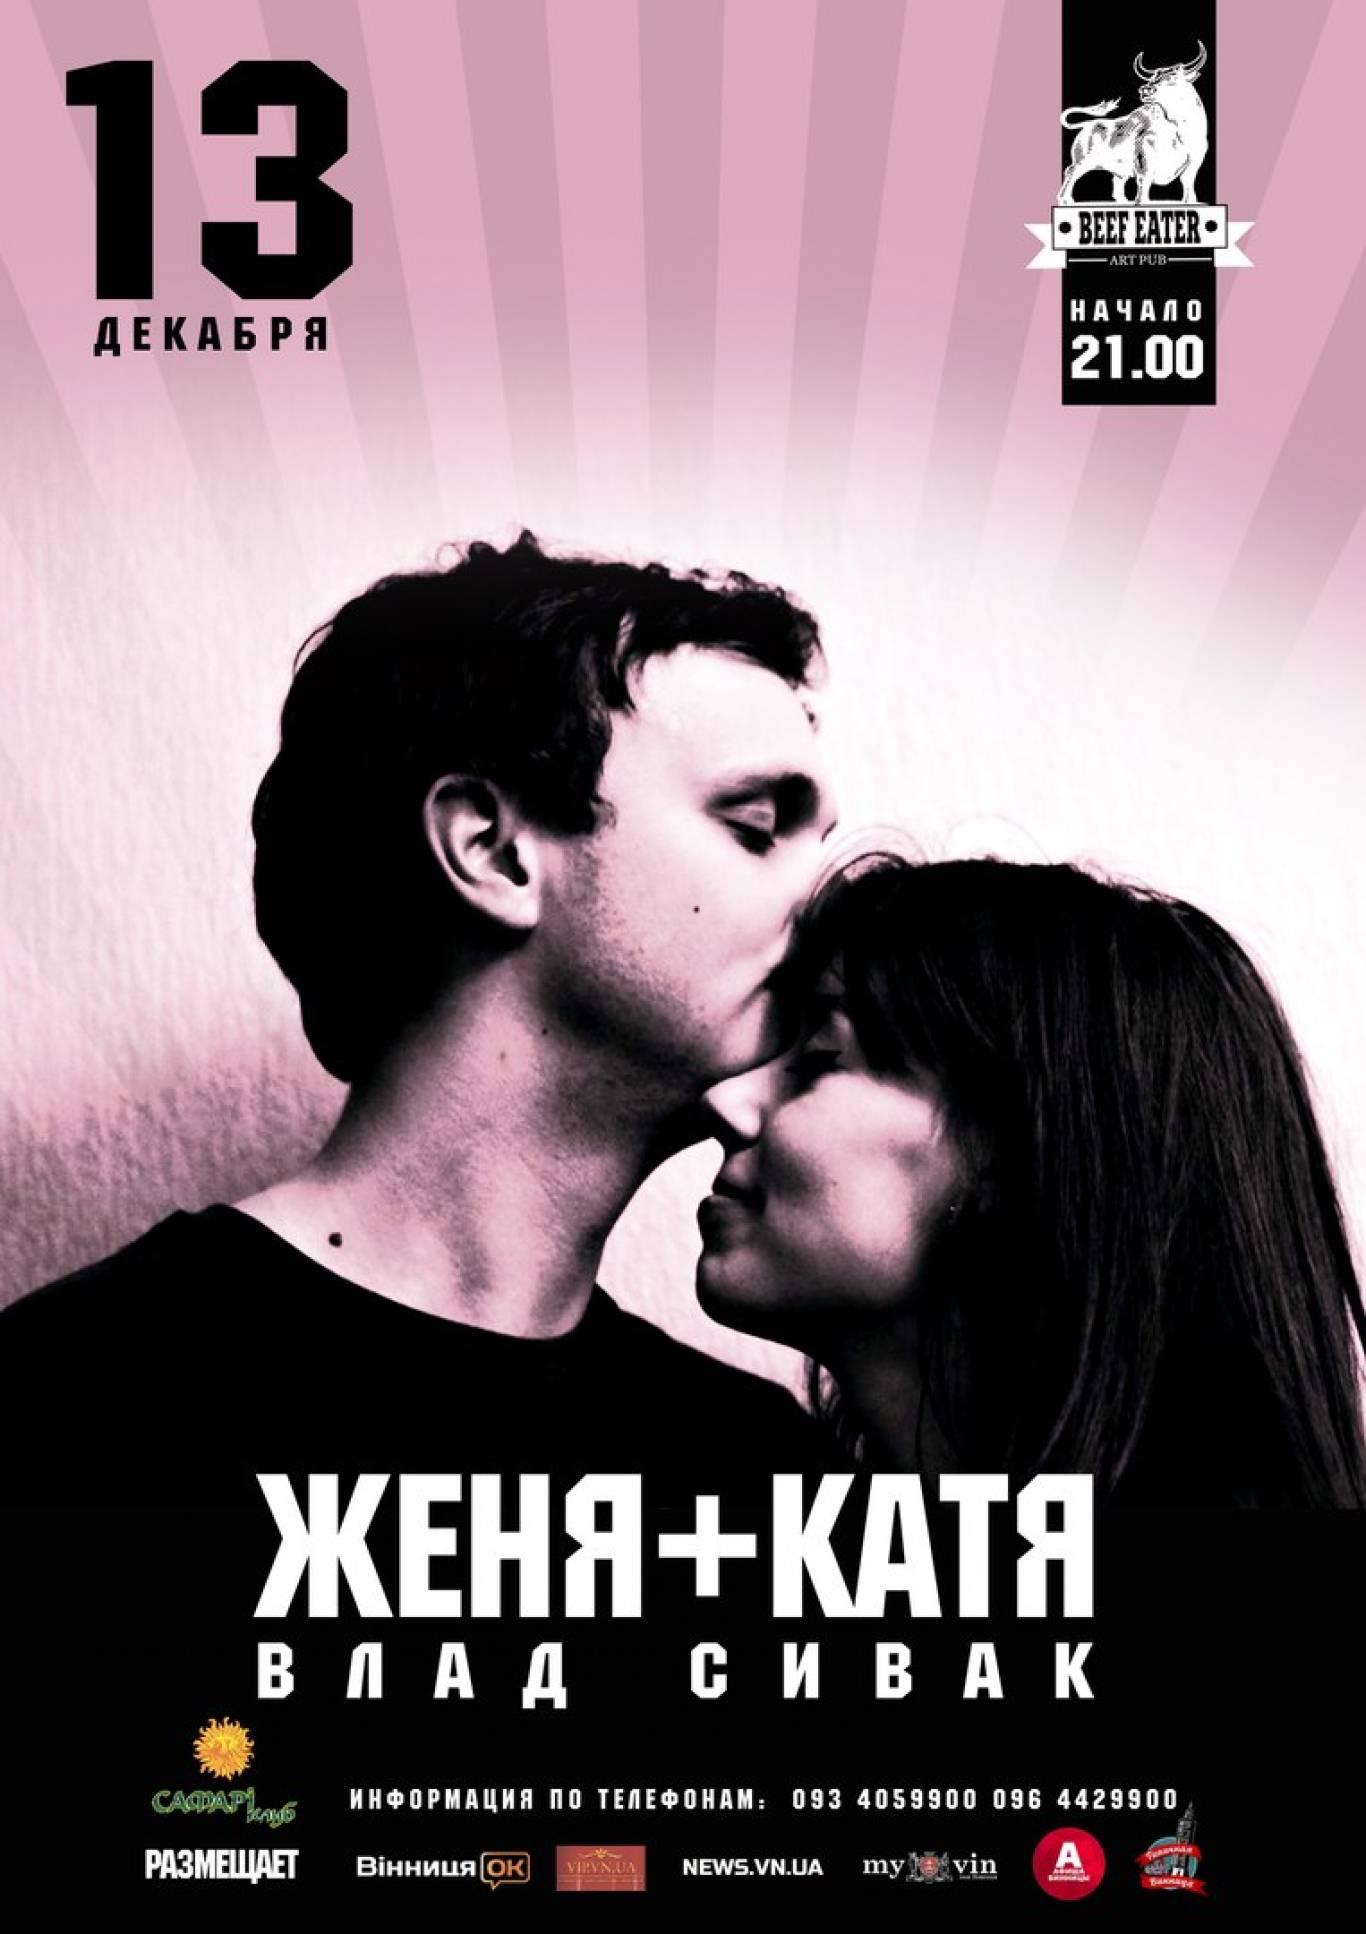 Женя+Катя та Влад Сівак з концертом у арт-пабі